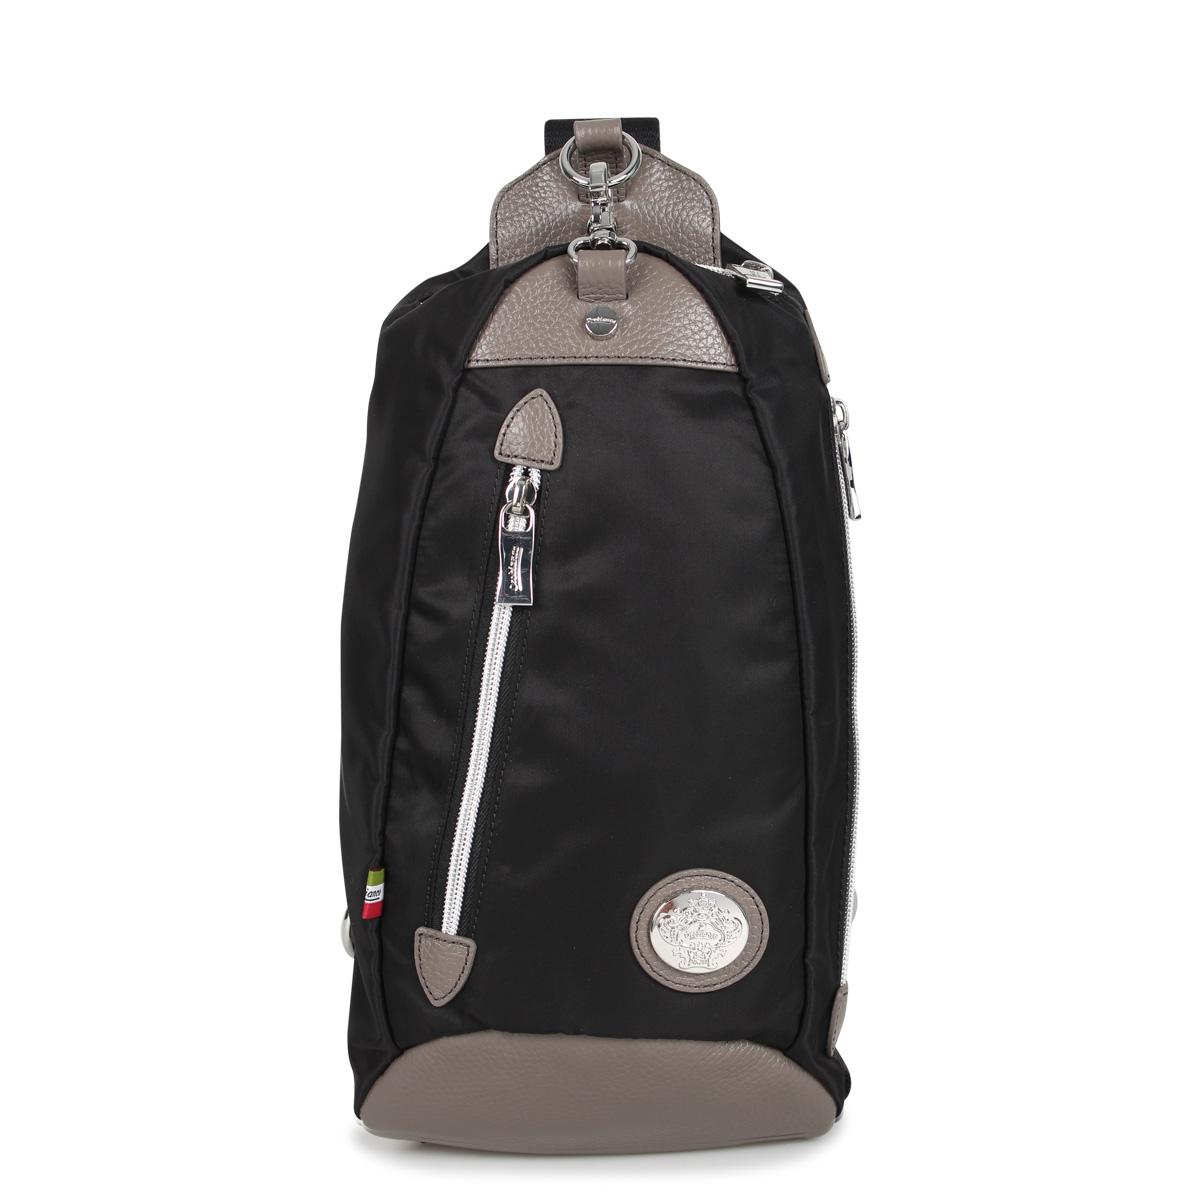 Orobianco DIMMYTE-C オロビアンコ バッグ ボディバッグ ショルダーバッグ メンズ ブラック ネイビー 黒 92163